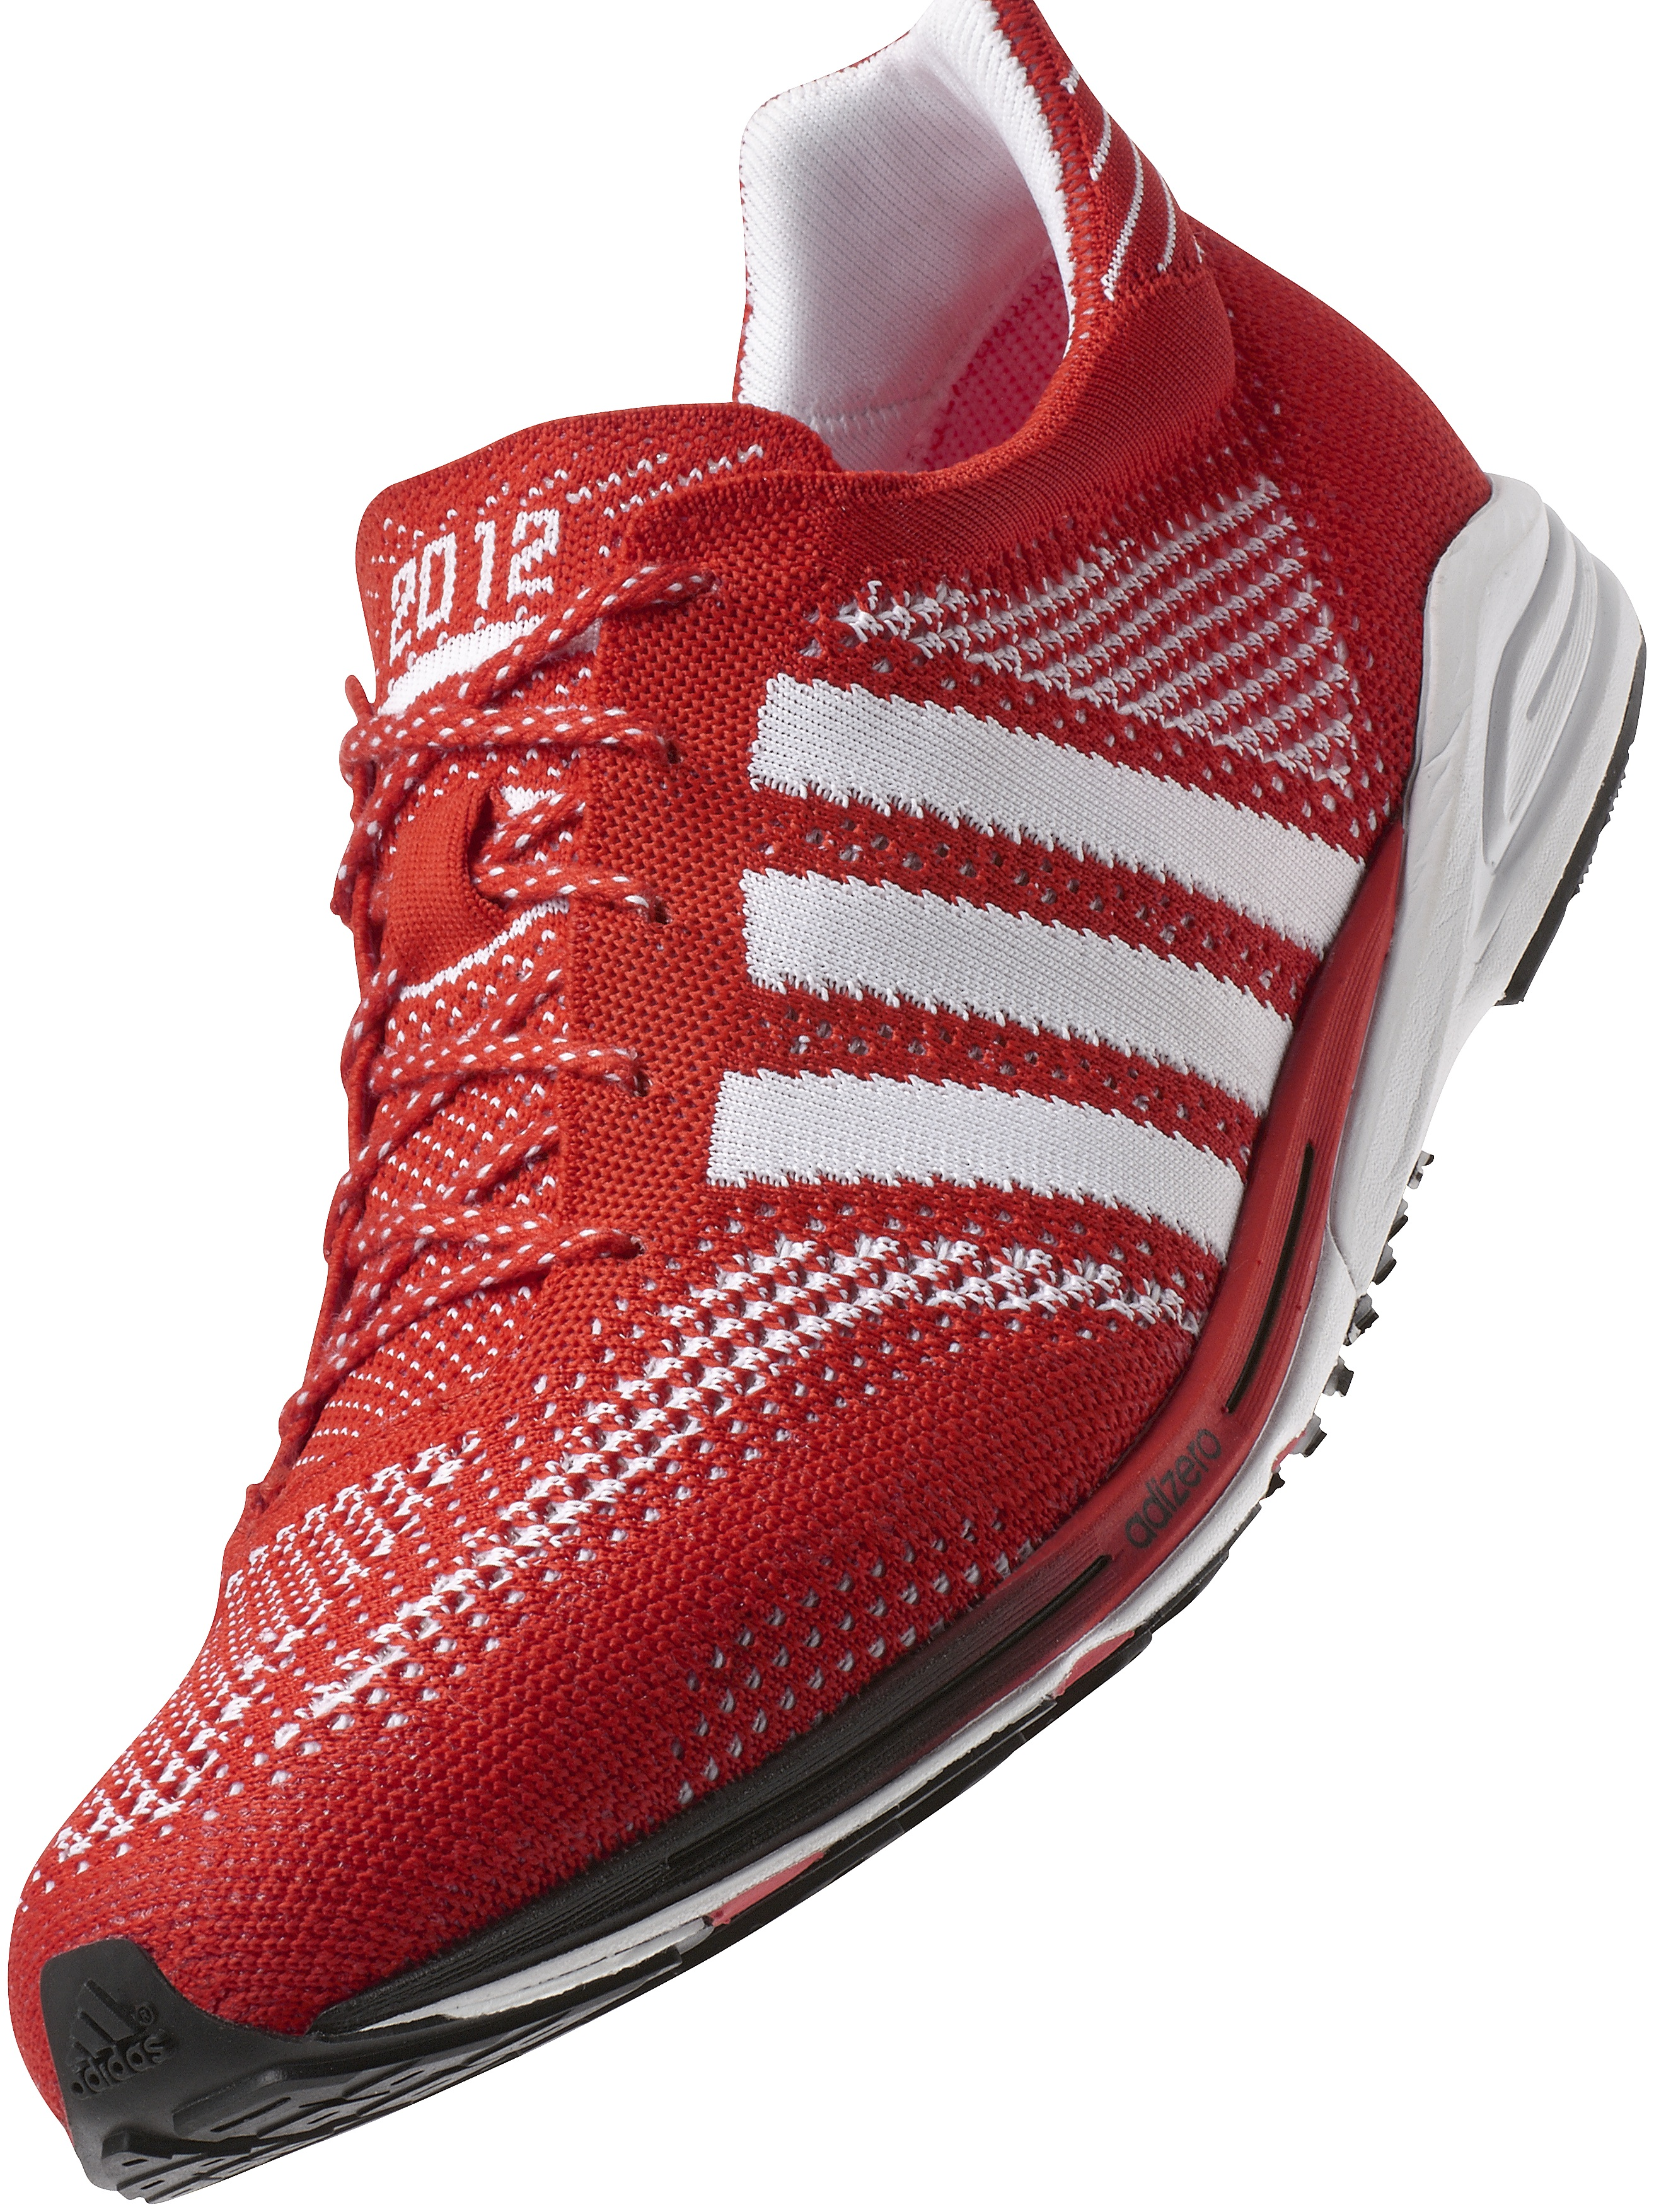 adidas adizero red sports shoes